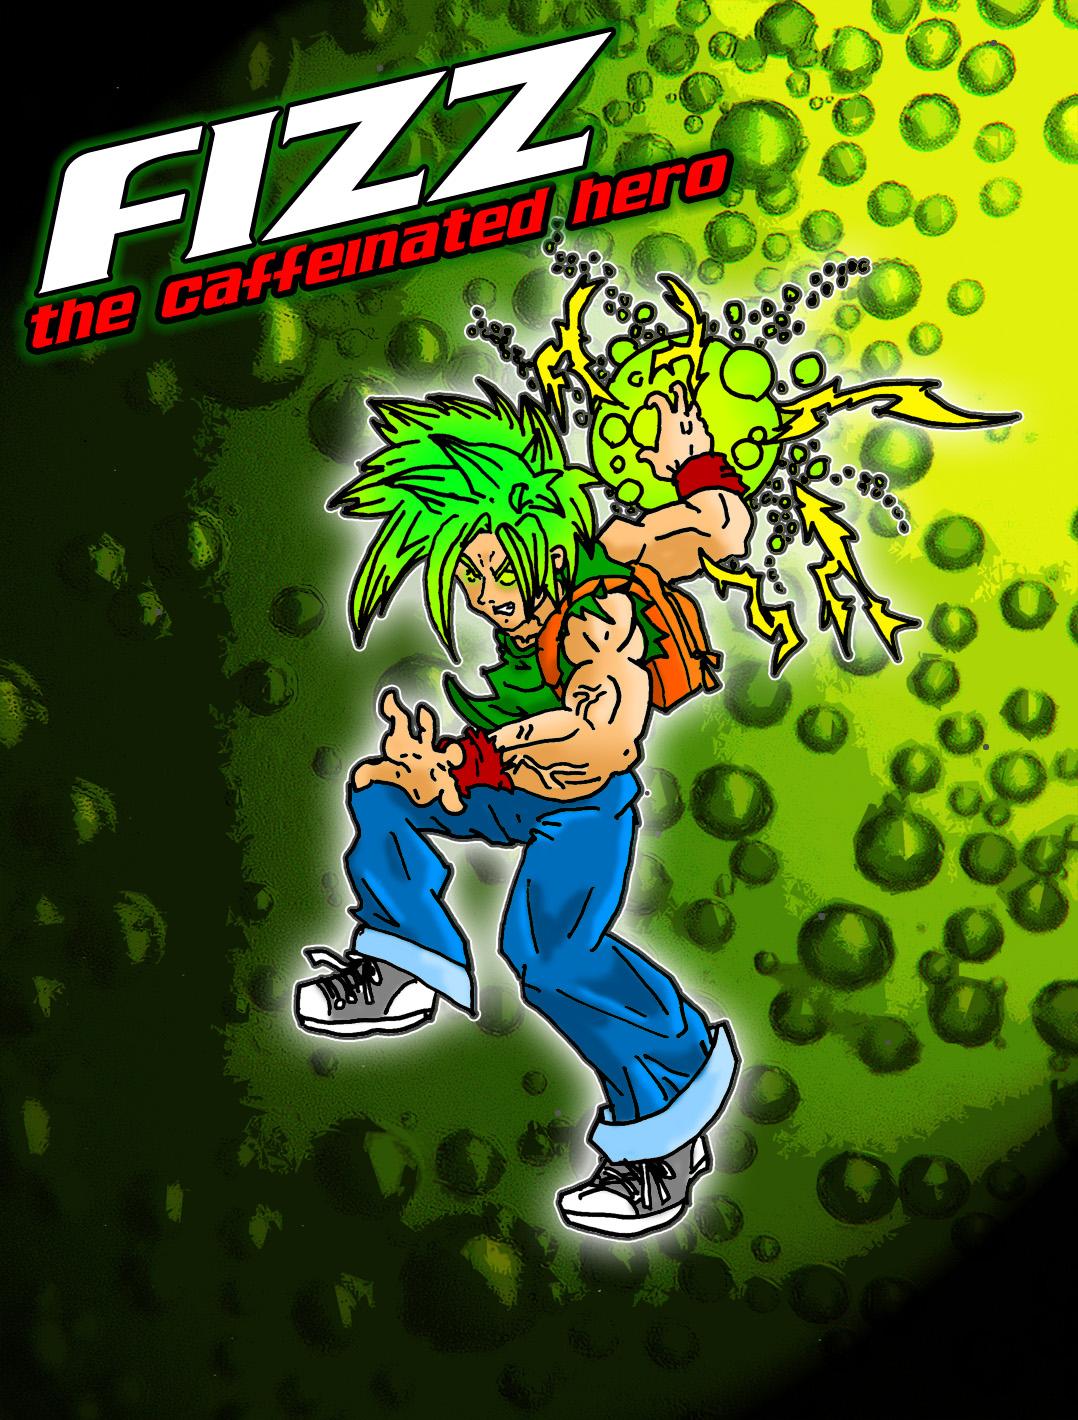 Fizz The Caffeinated Hero